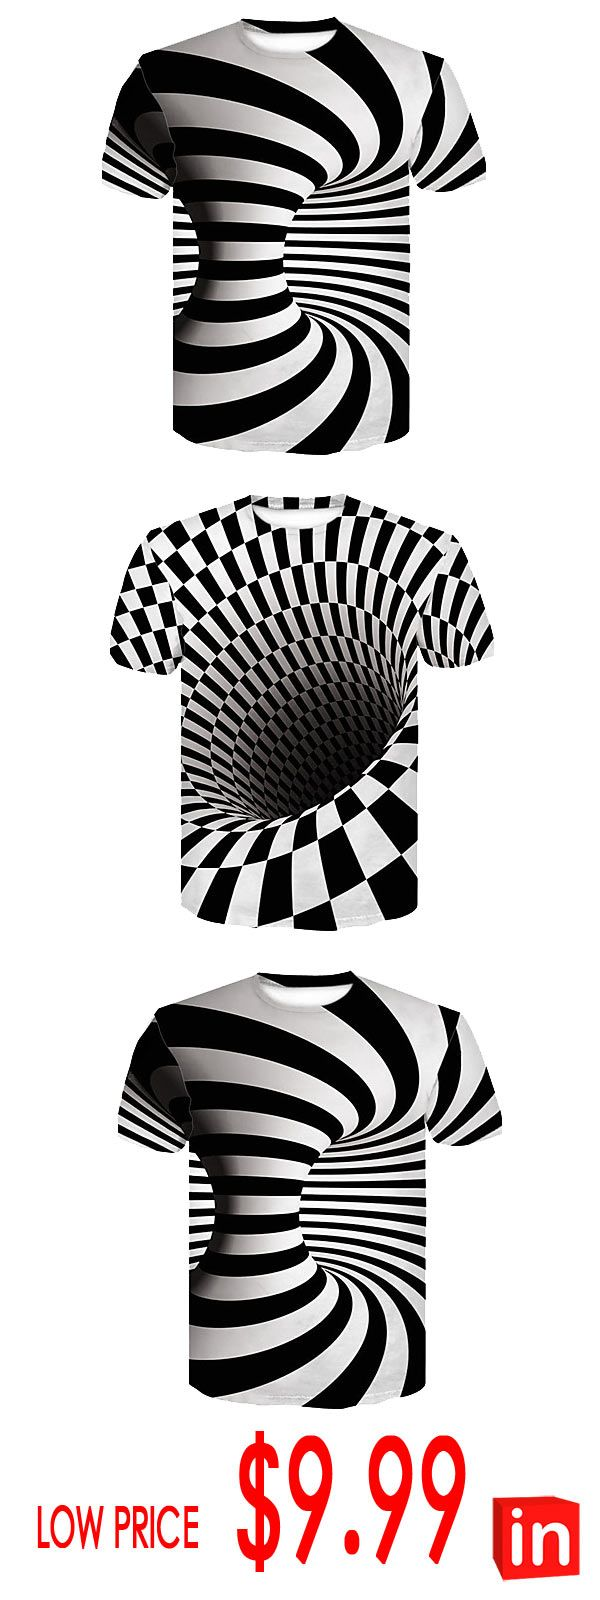 Men's Club Basic / Street chic T-shirt – Color Block Black & White, Print Round Neck White